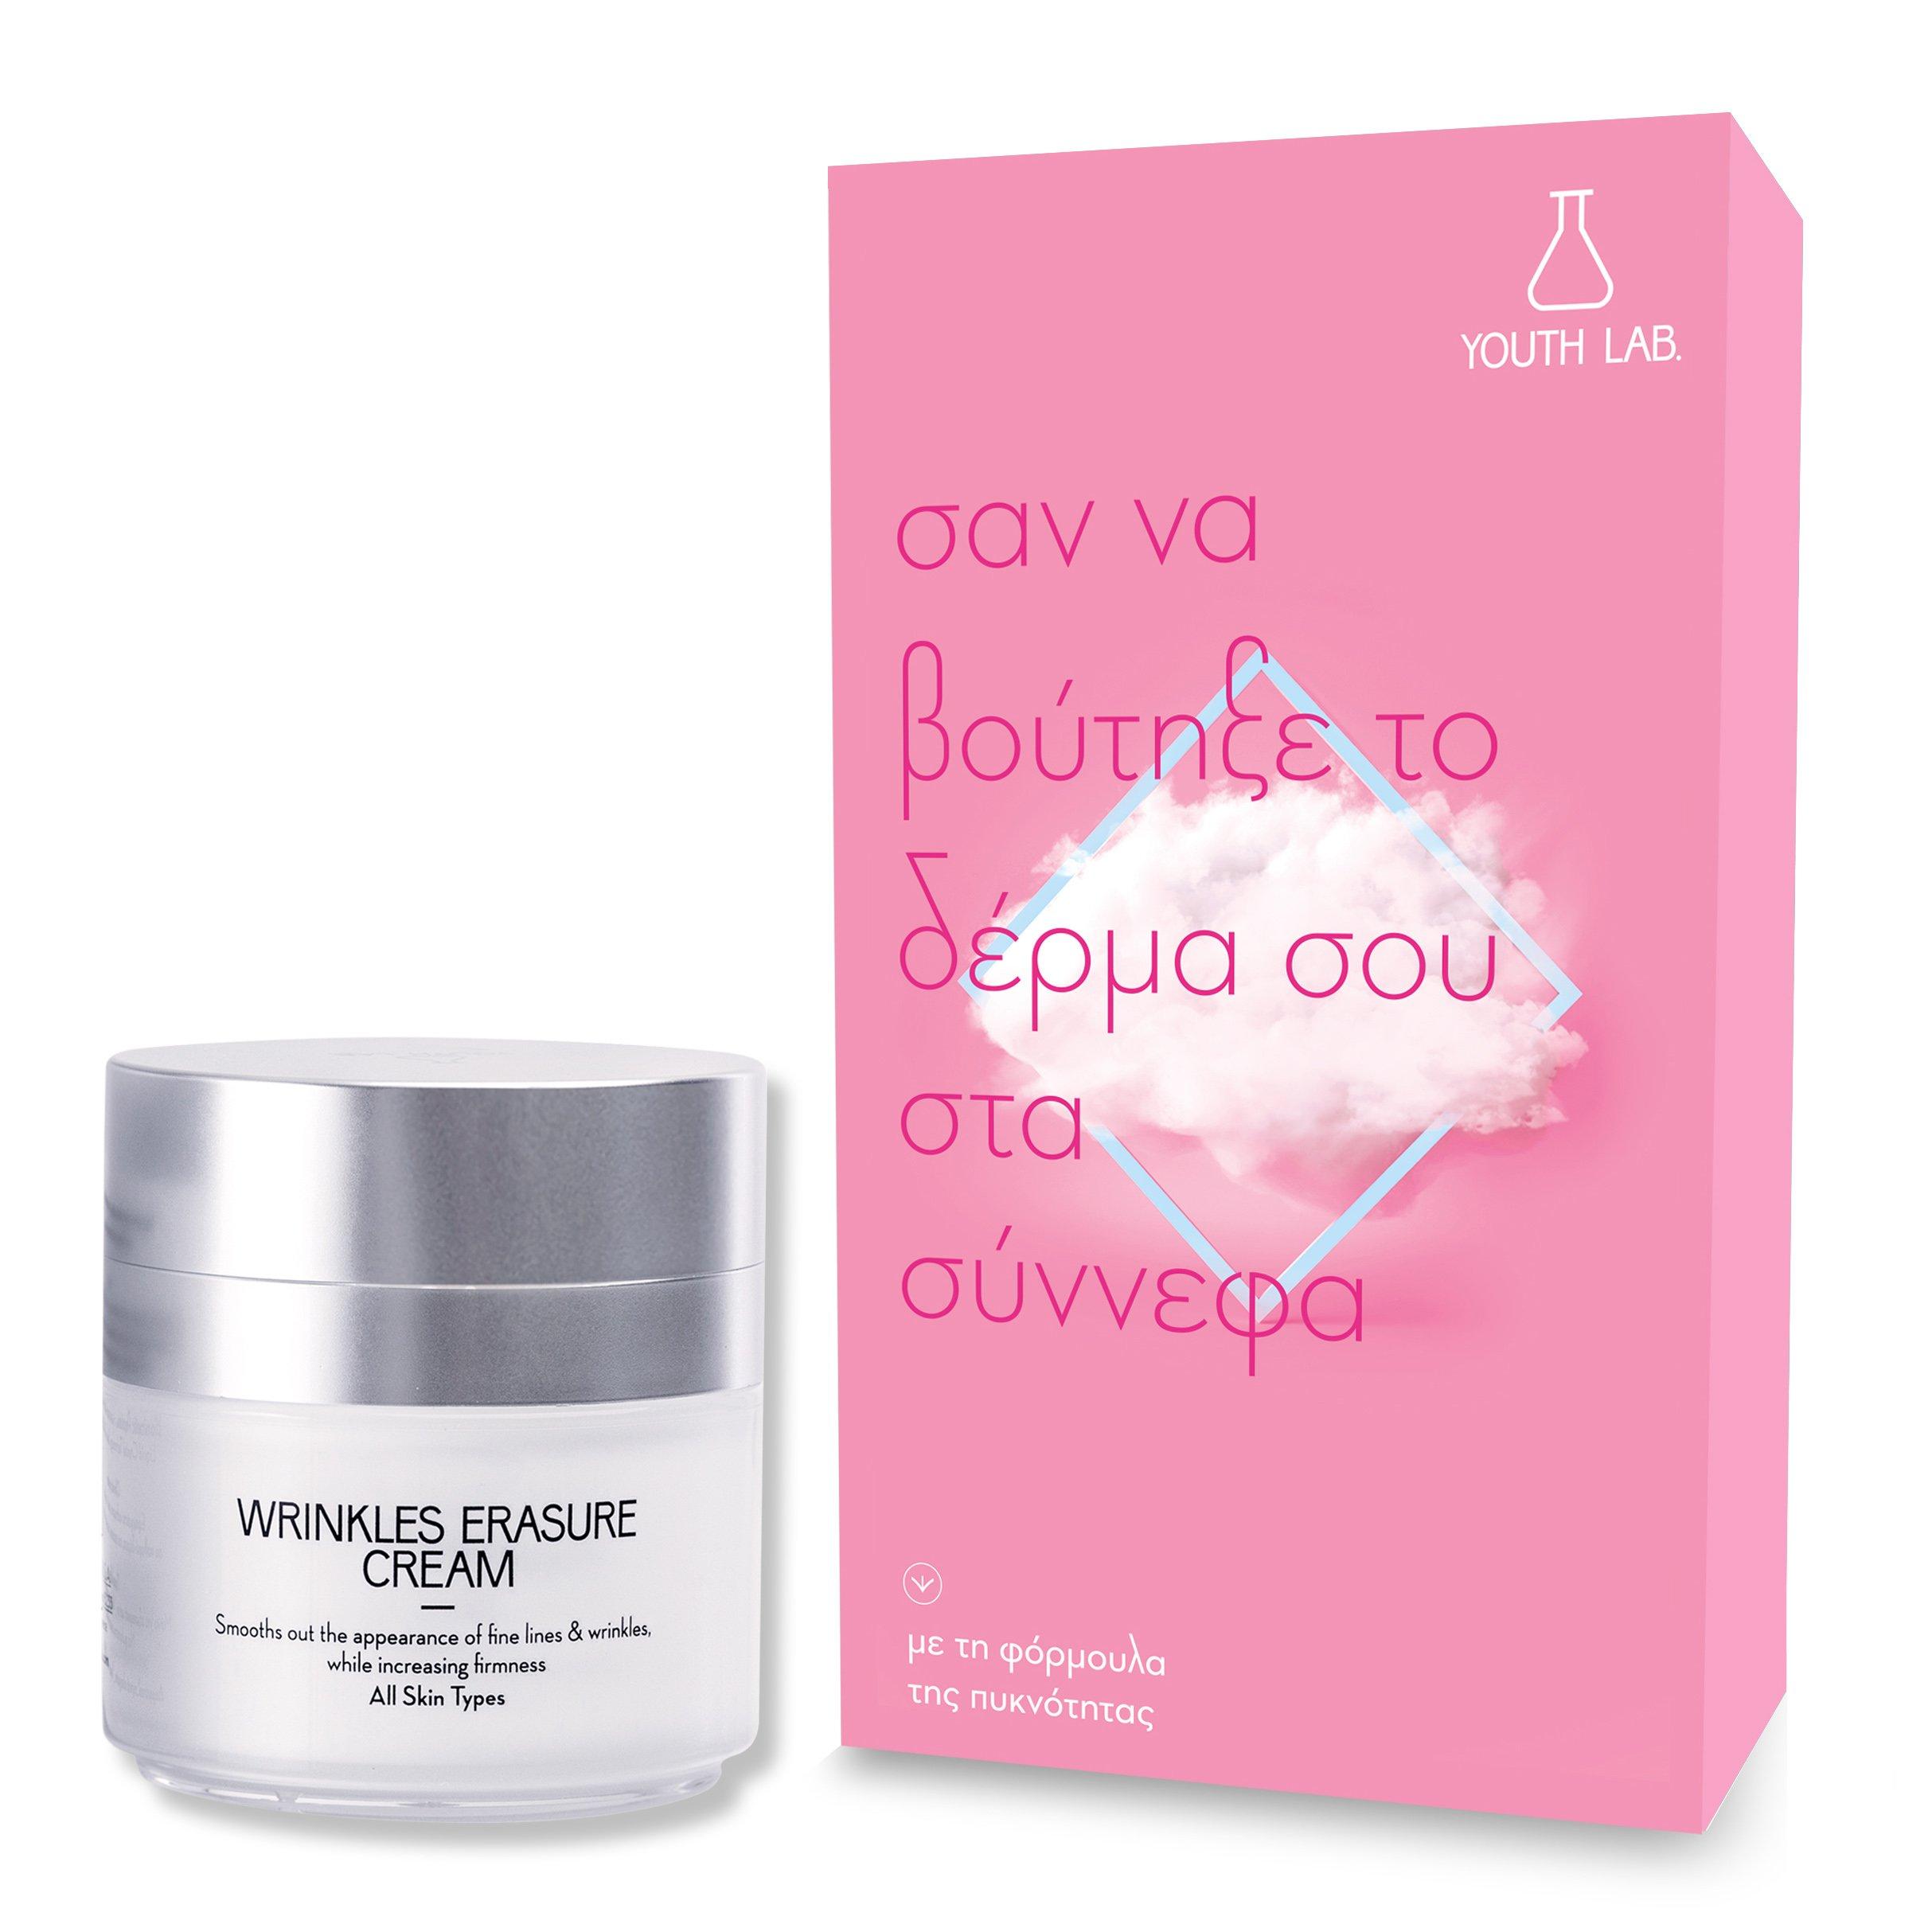 Youth Lab Wrinkles Erasure Cream All Skin Types Limited Edition 24ωρη Αντιρυτιδική-Συσφικτική Κρέμα Lifting Προσώπου 50ml